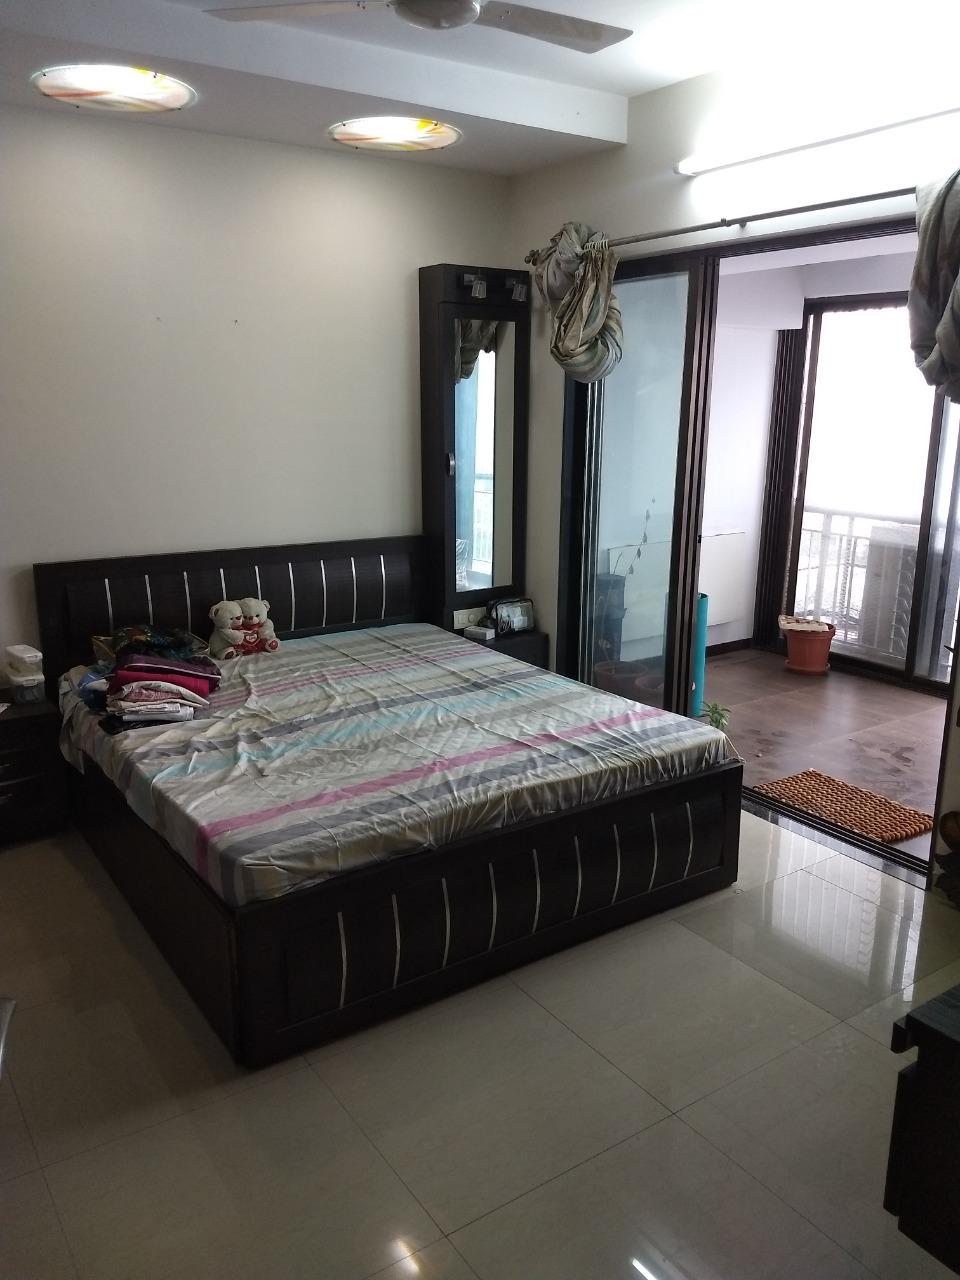 3 Bhk on Sale in Dadar East @4.75 Cr